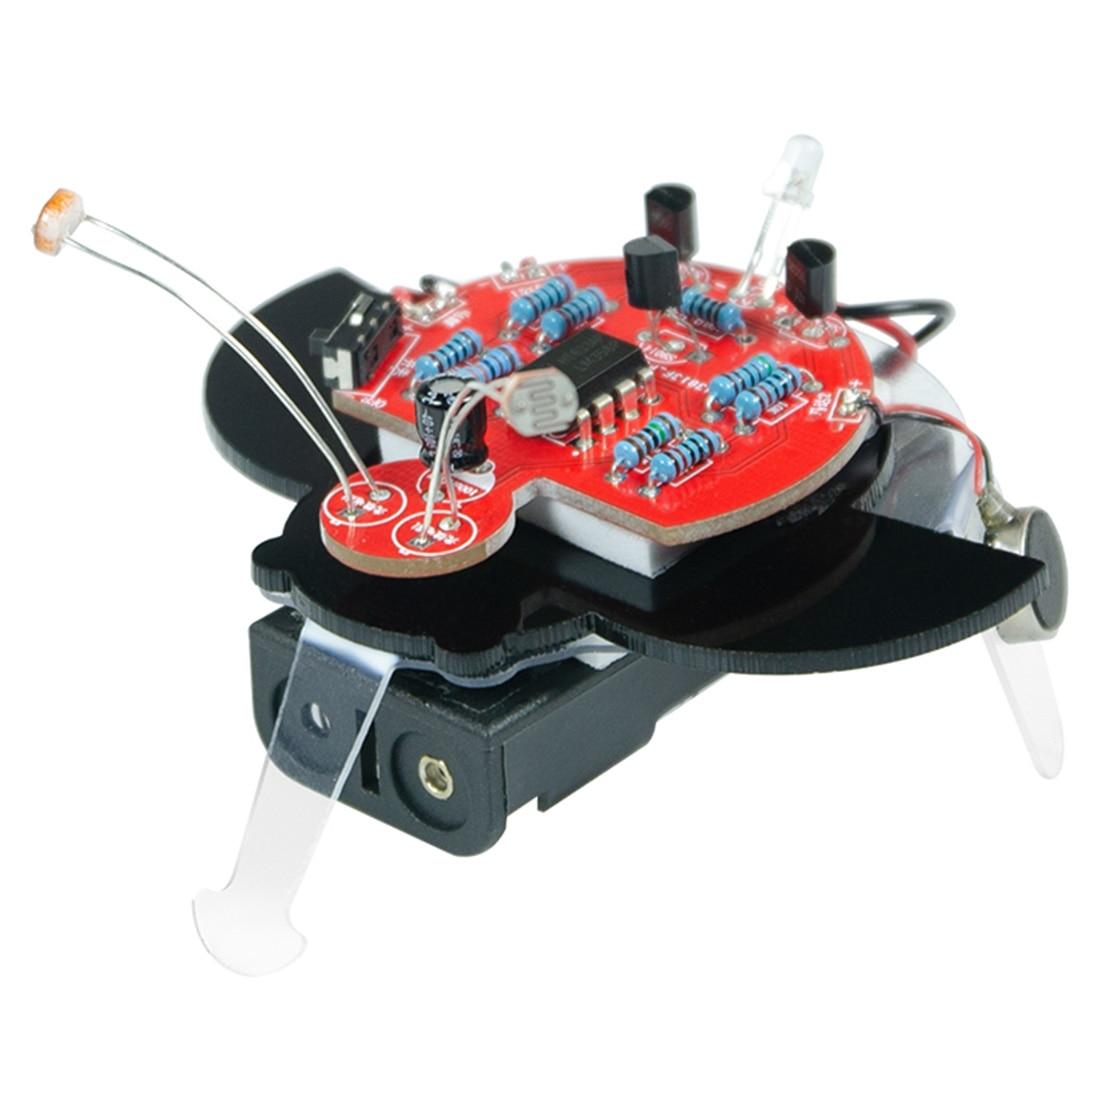 MODIKER DIY Fireworm Glowworm STEAM Photographic Robot Educational Kit  Photo Resistor Programmable Toys